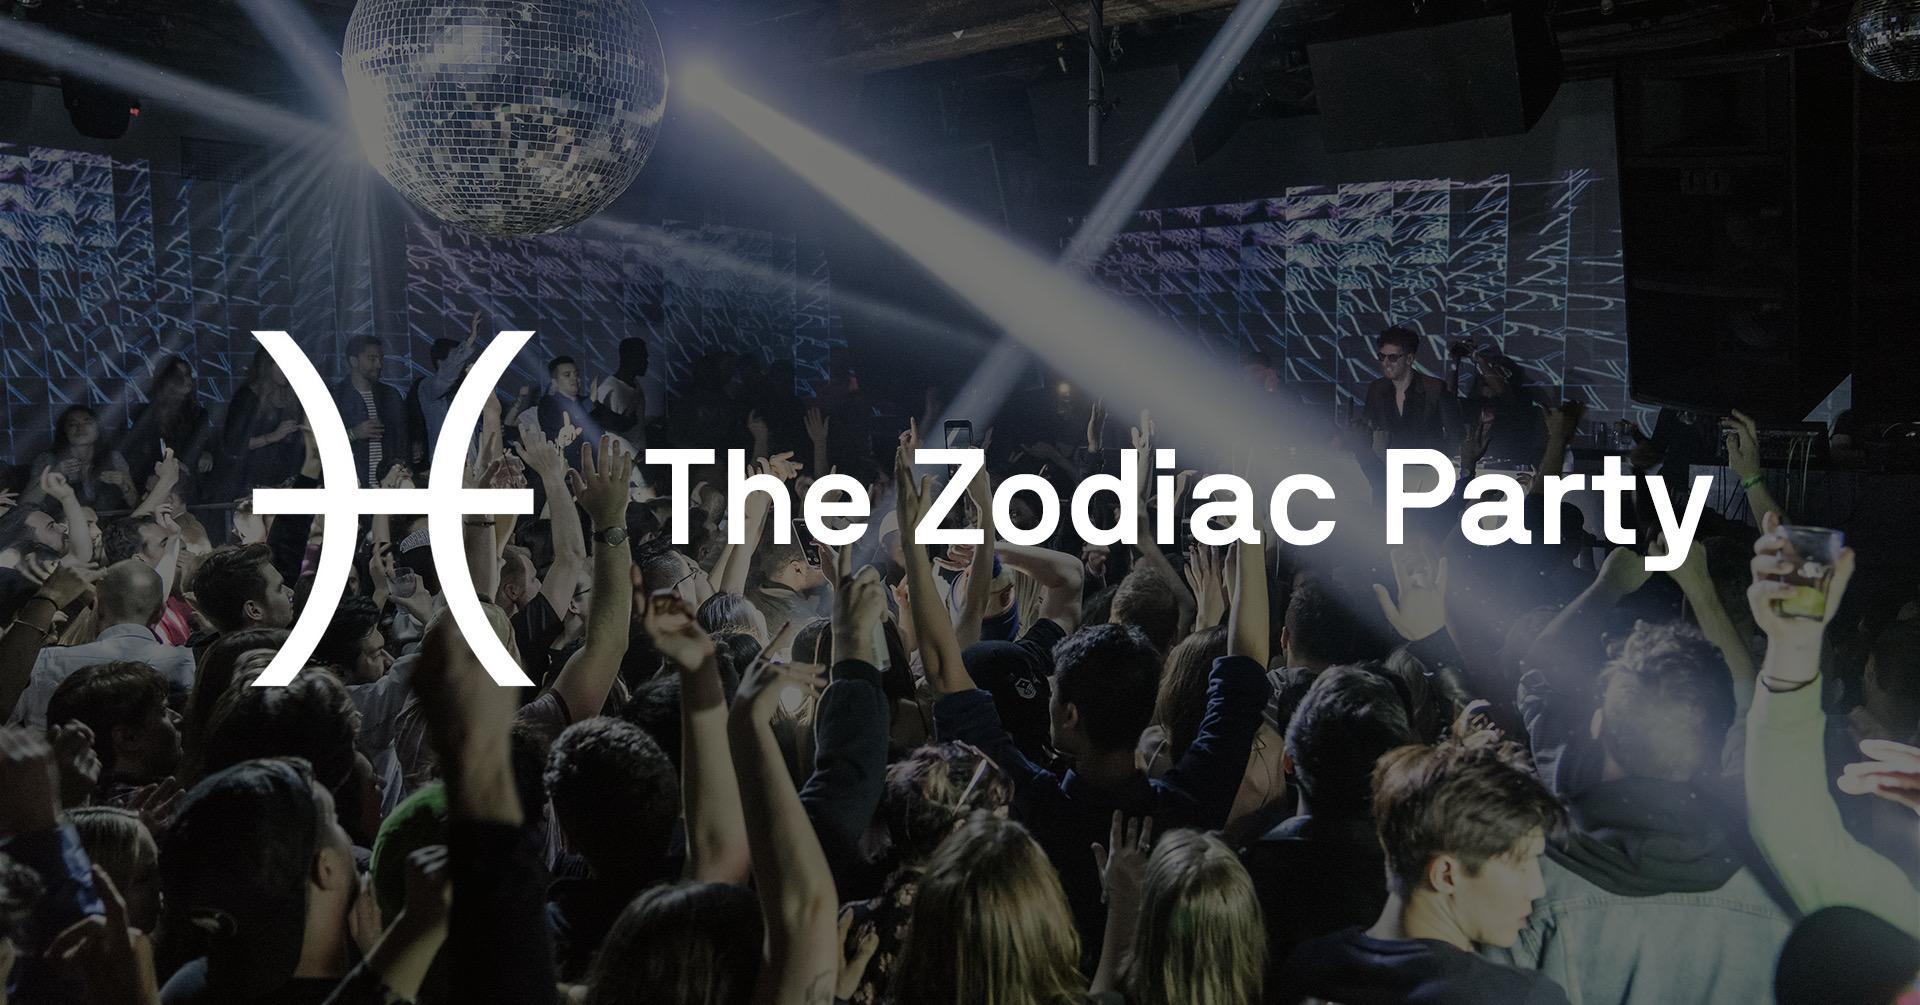 ZodiacParty_promo_2 (1).jpeg